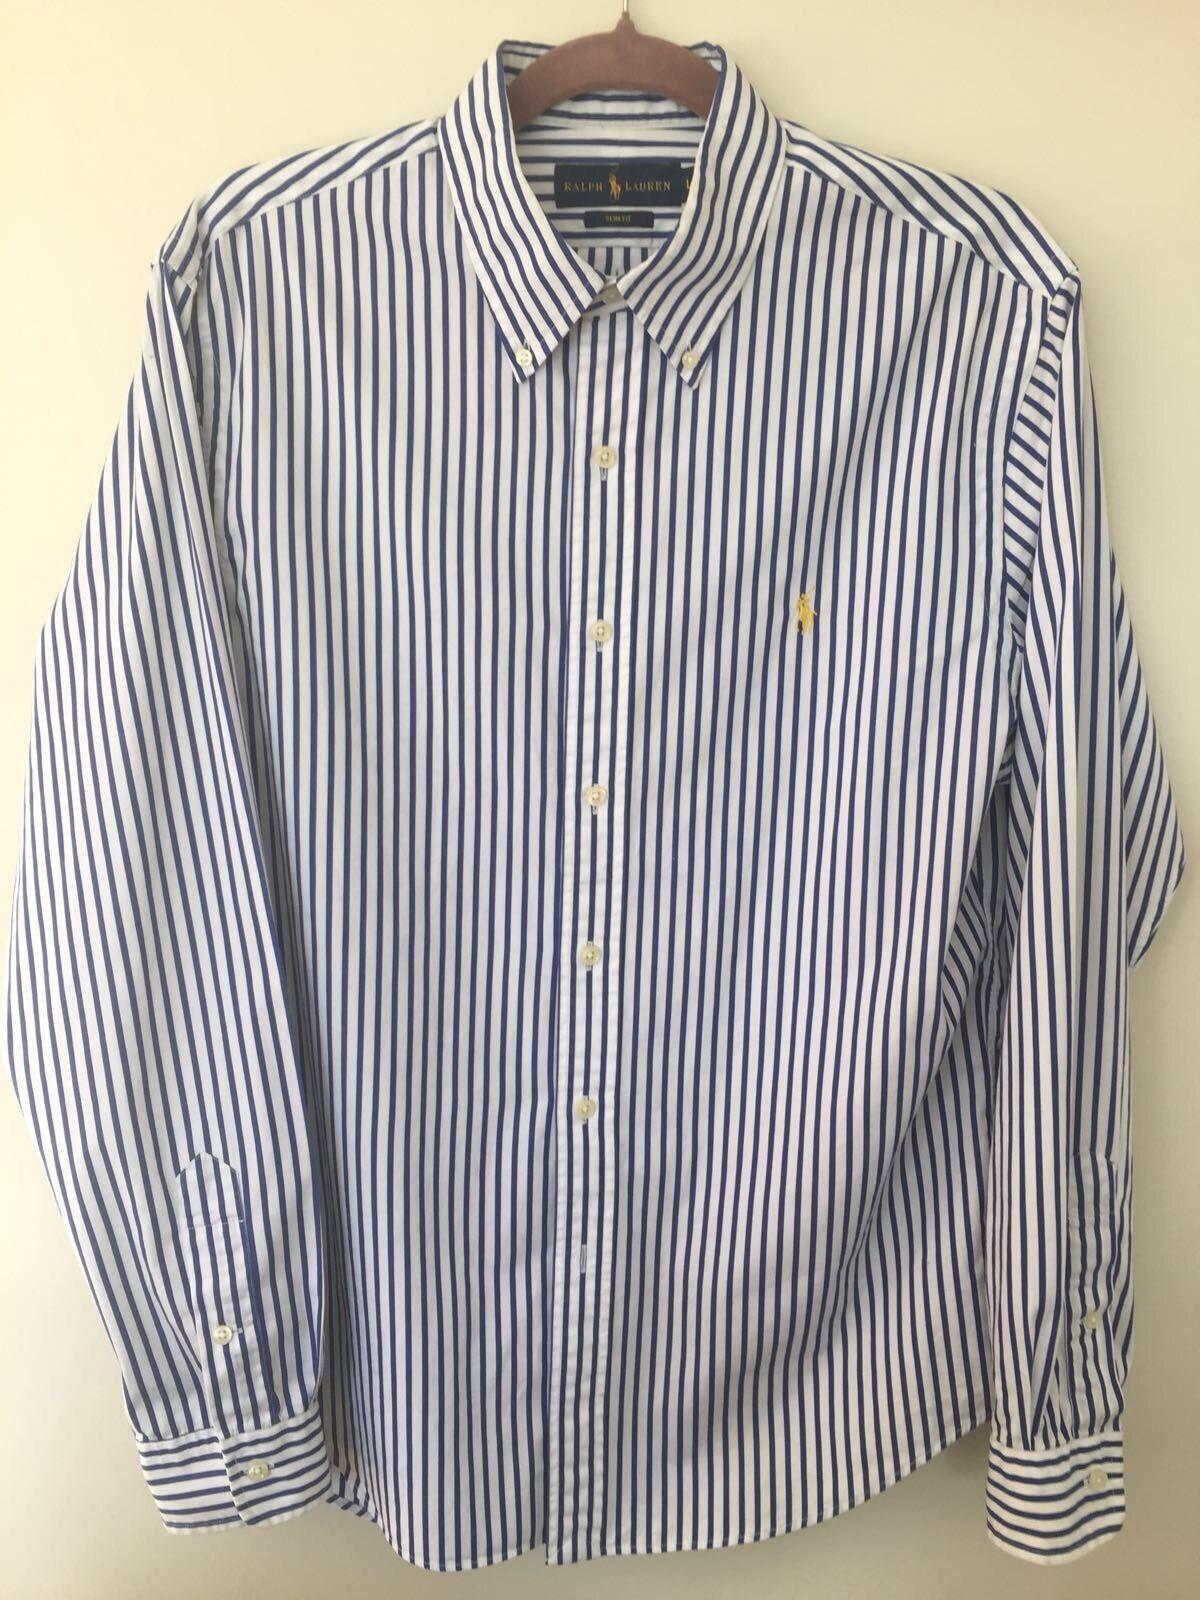 Ralph Lauren Polo Slim Fit Stripe Shirt, Large